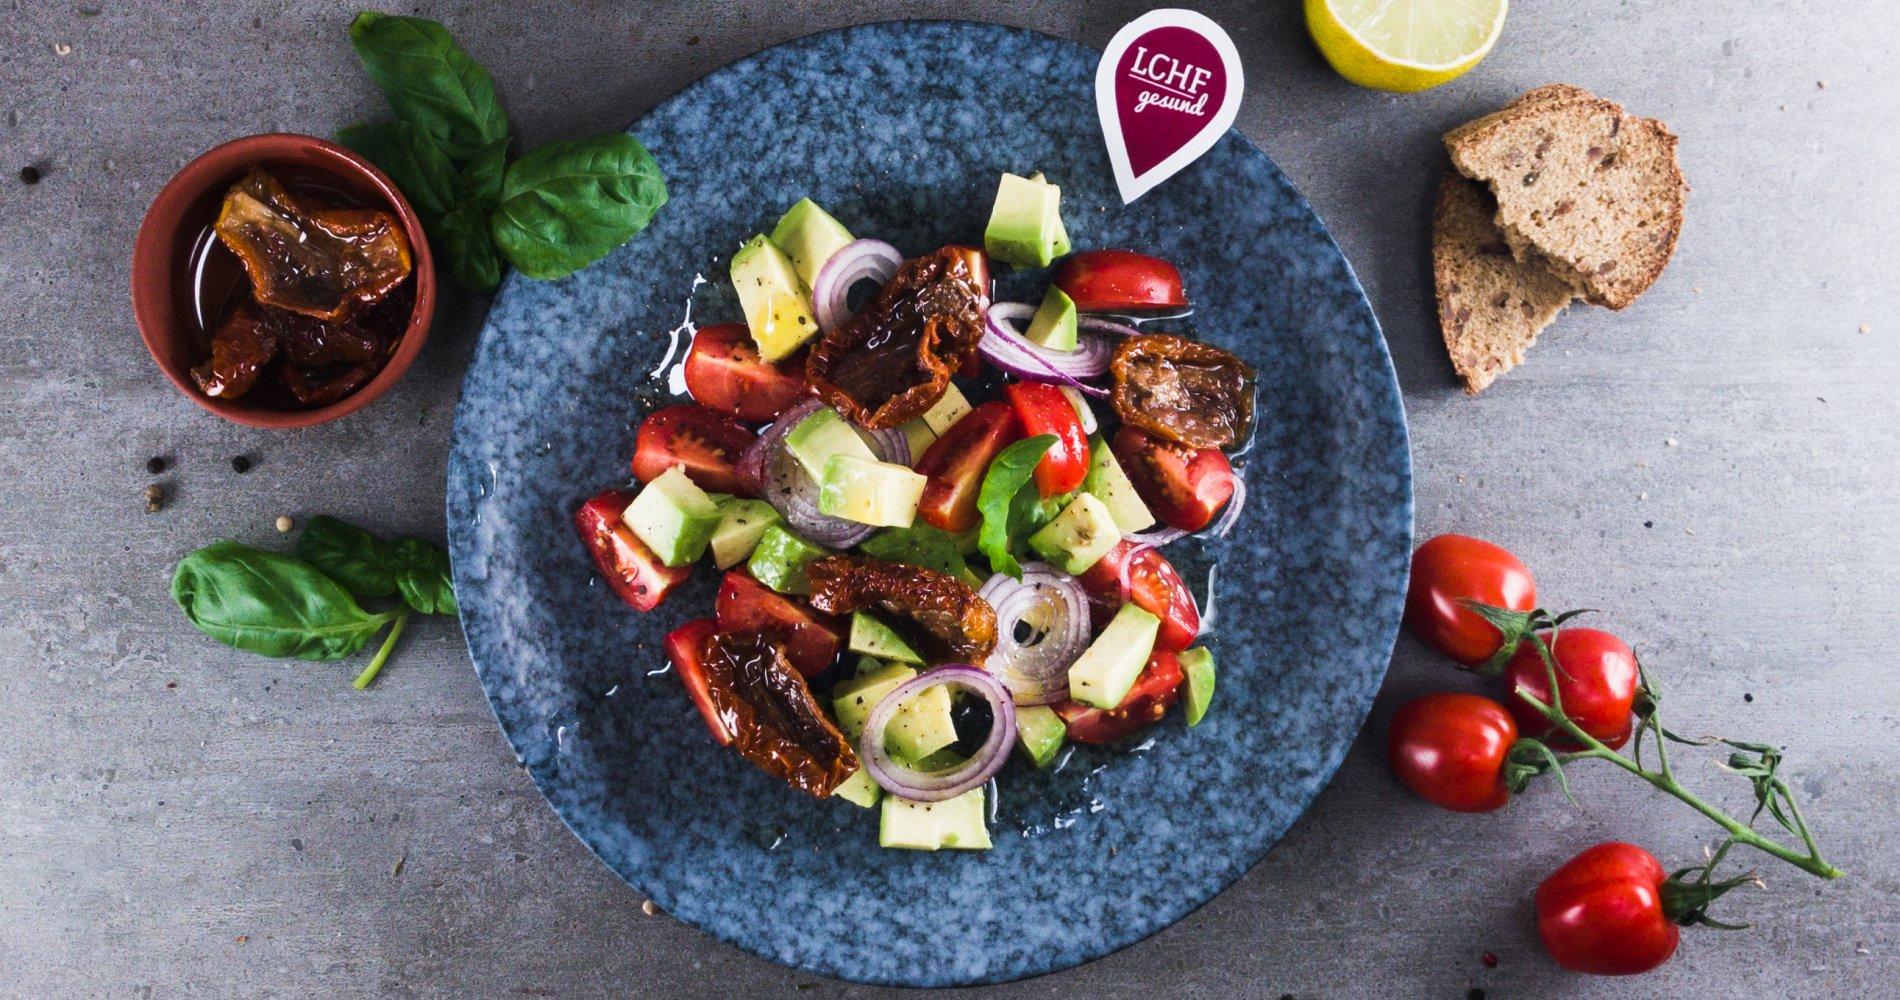 Rezept Low Carb: Tomaten-Avocado-Salat - LCHF-gesund.de